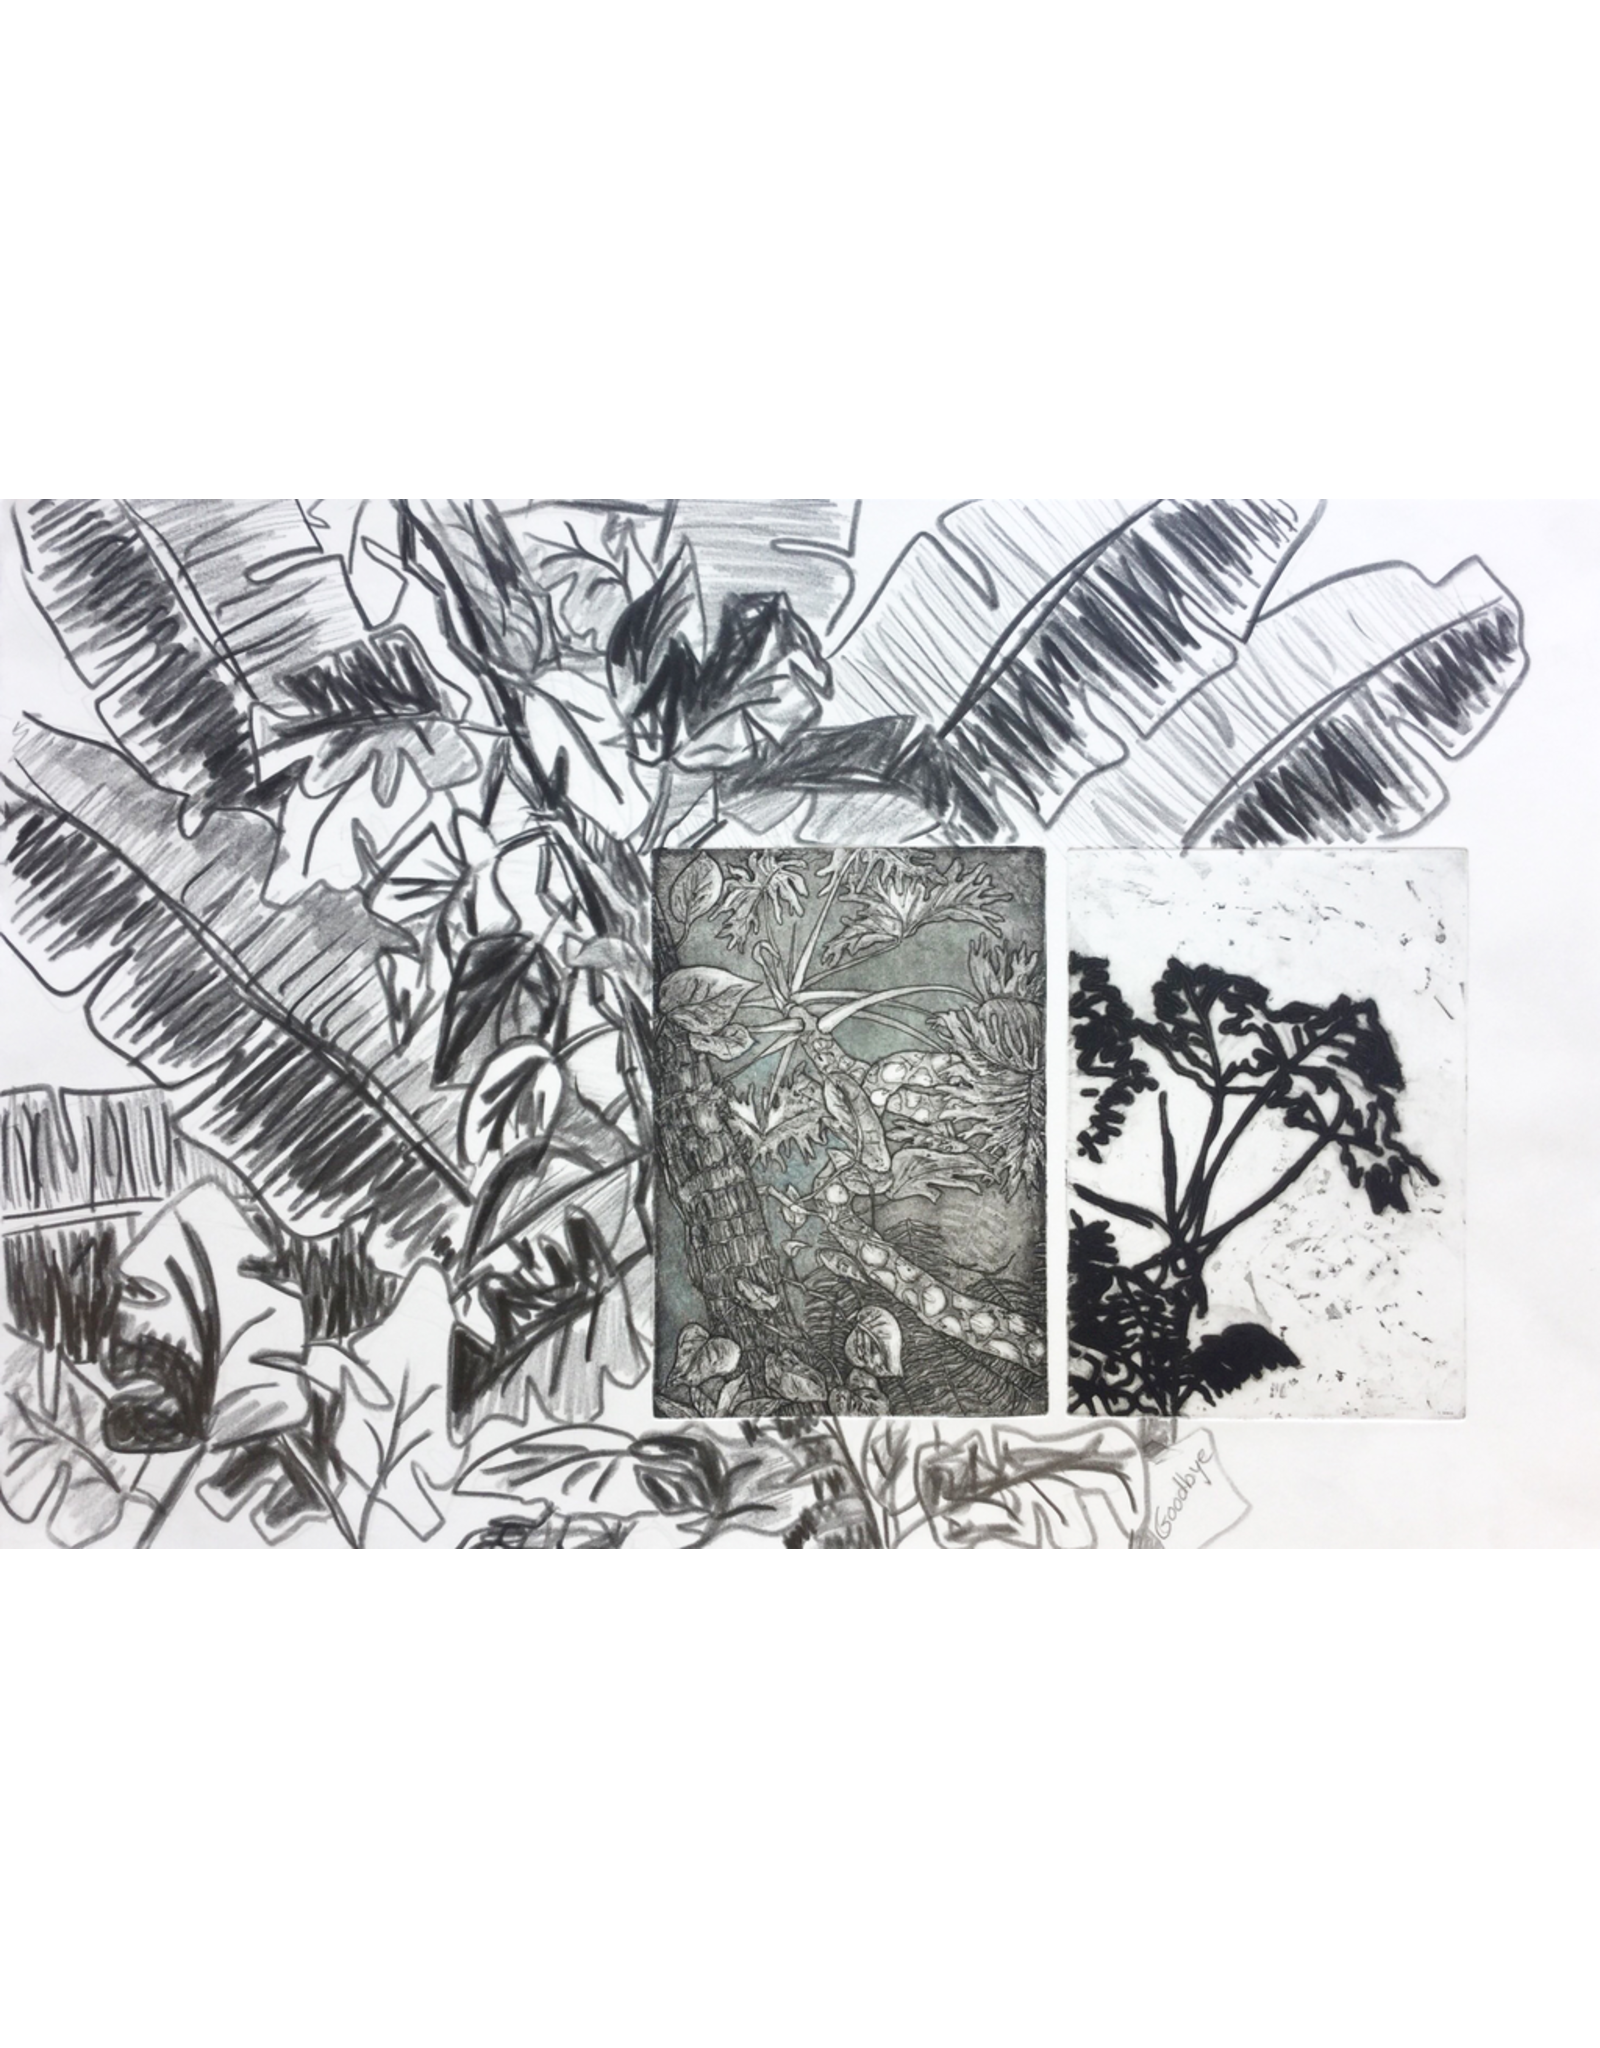 Cornelius, Karen Plants Imprinted (on Mind and Paper), Karen Cornelius